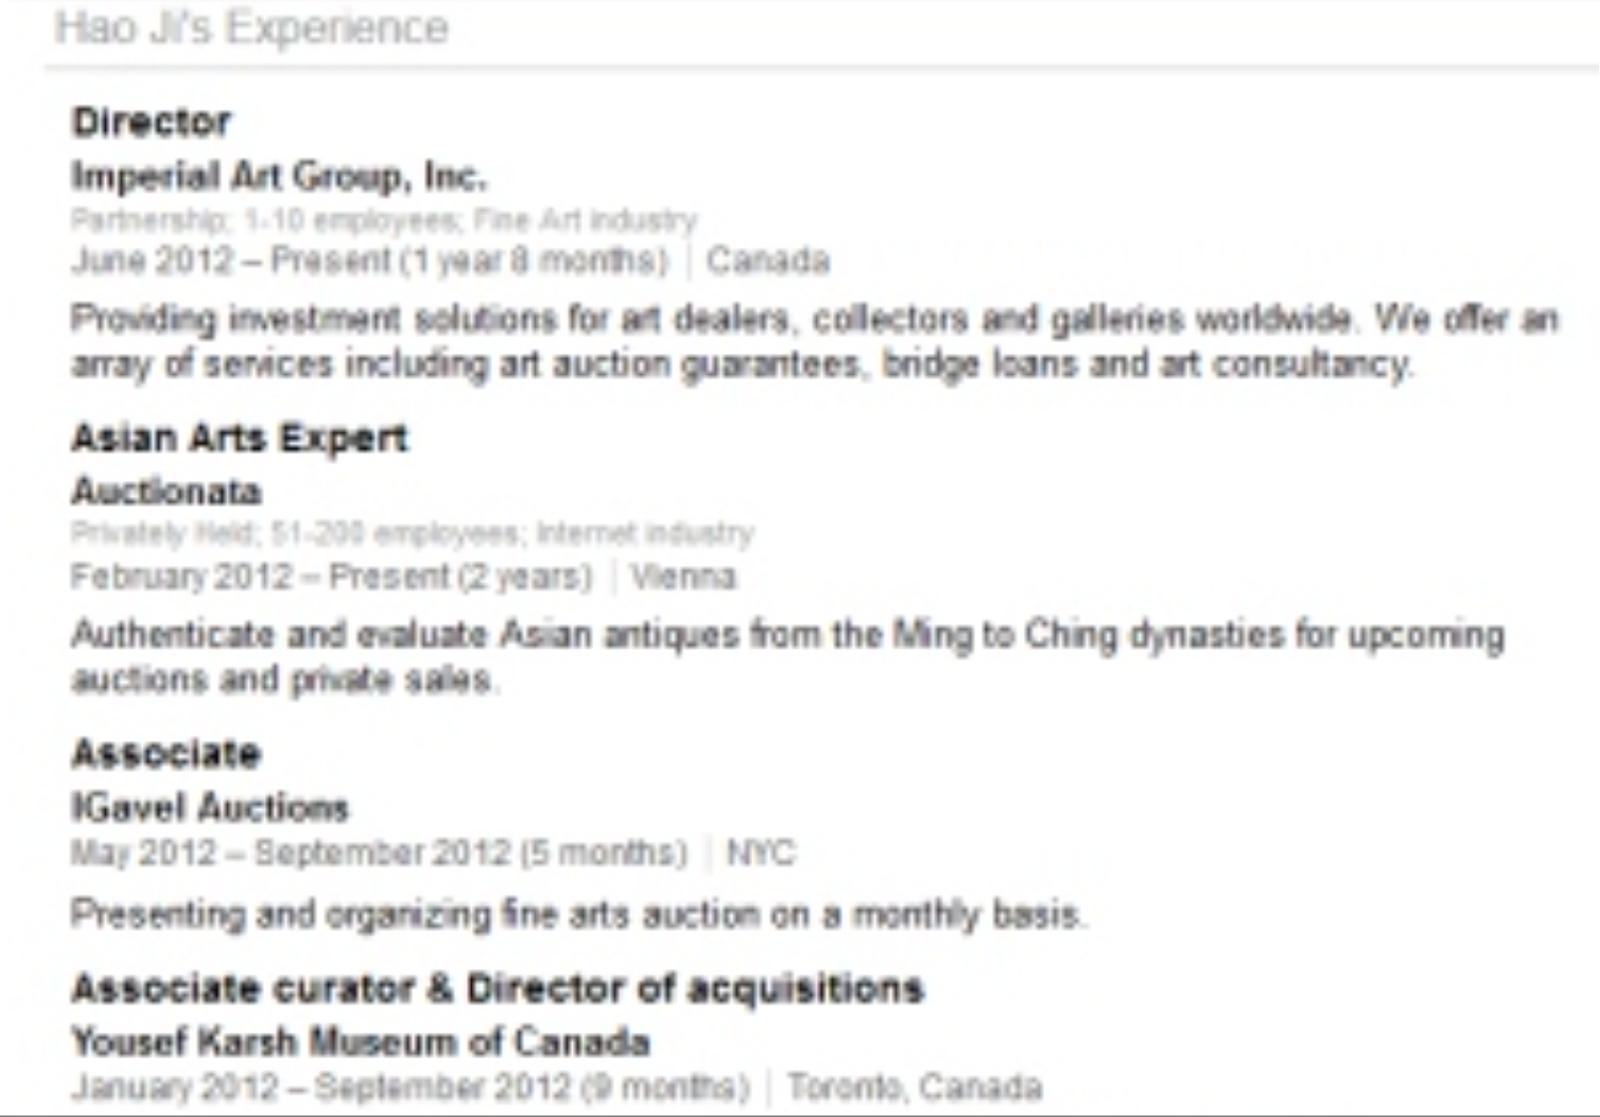 Linkedin resume of Convicted fraudster and former Auctionata employee Hao Ji aka Joseph Hokai Tang